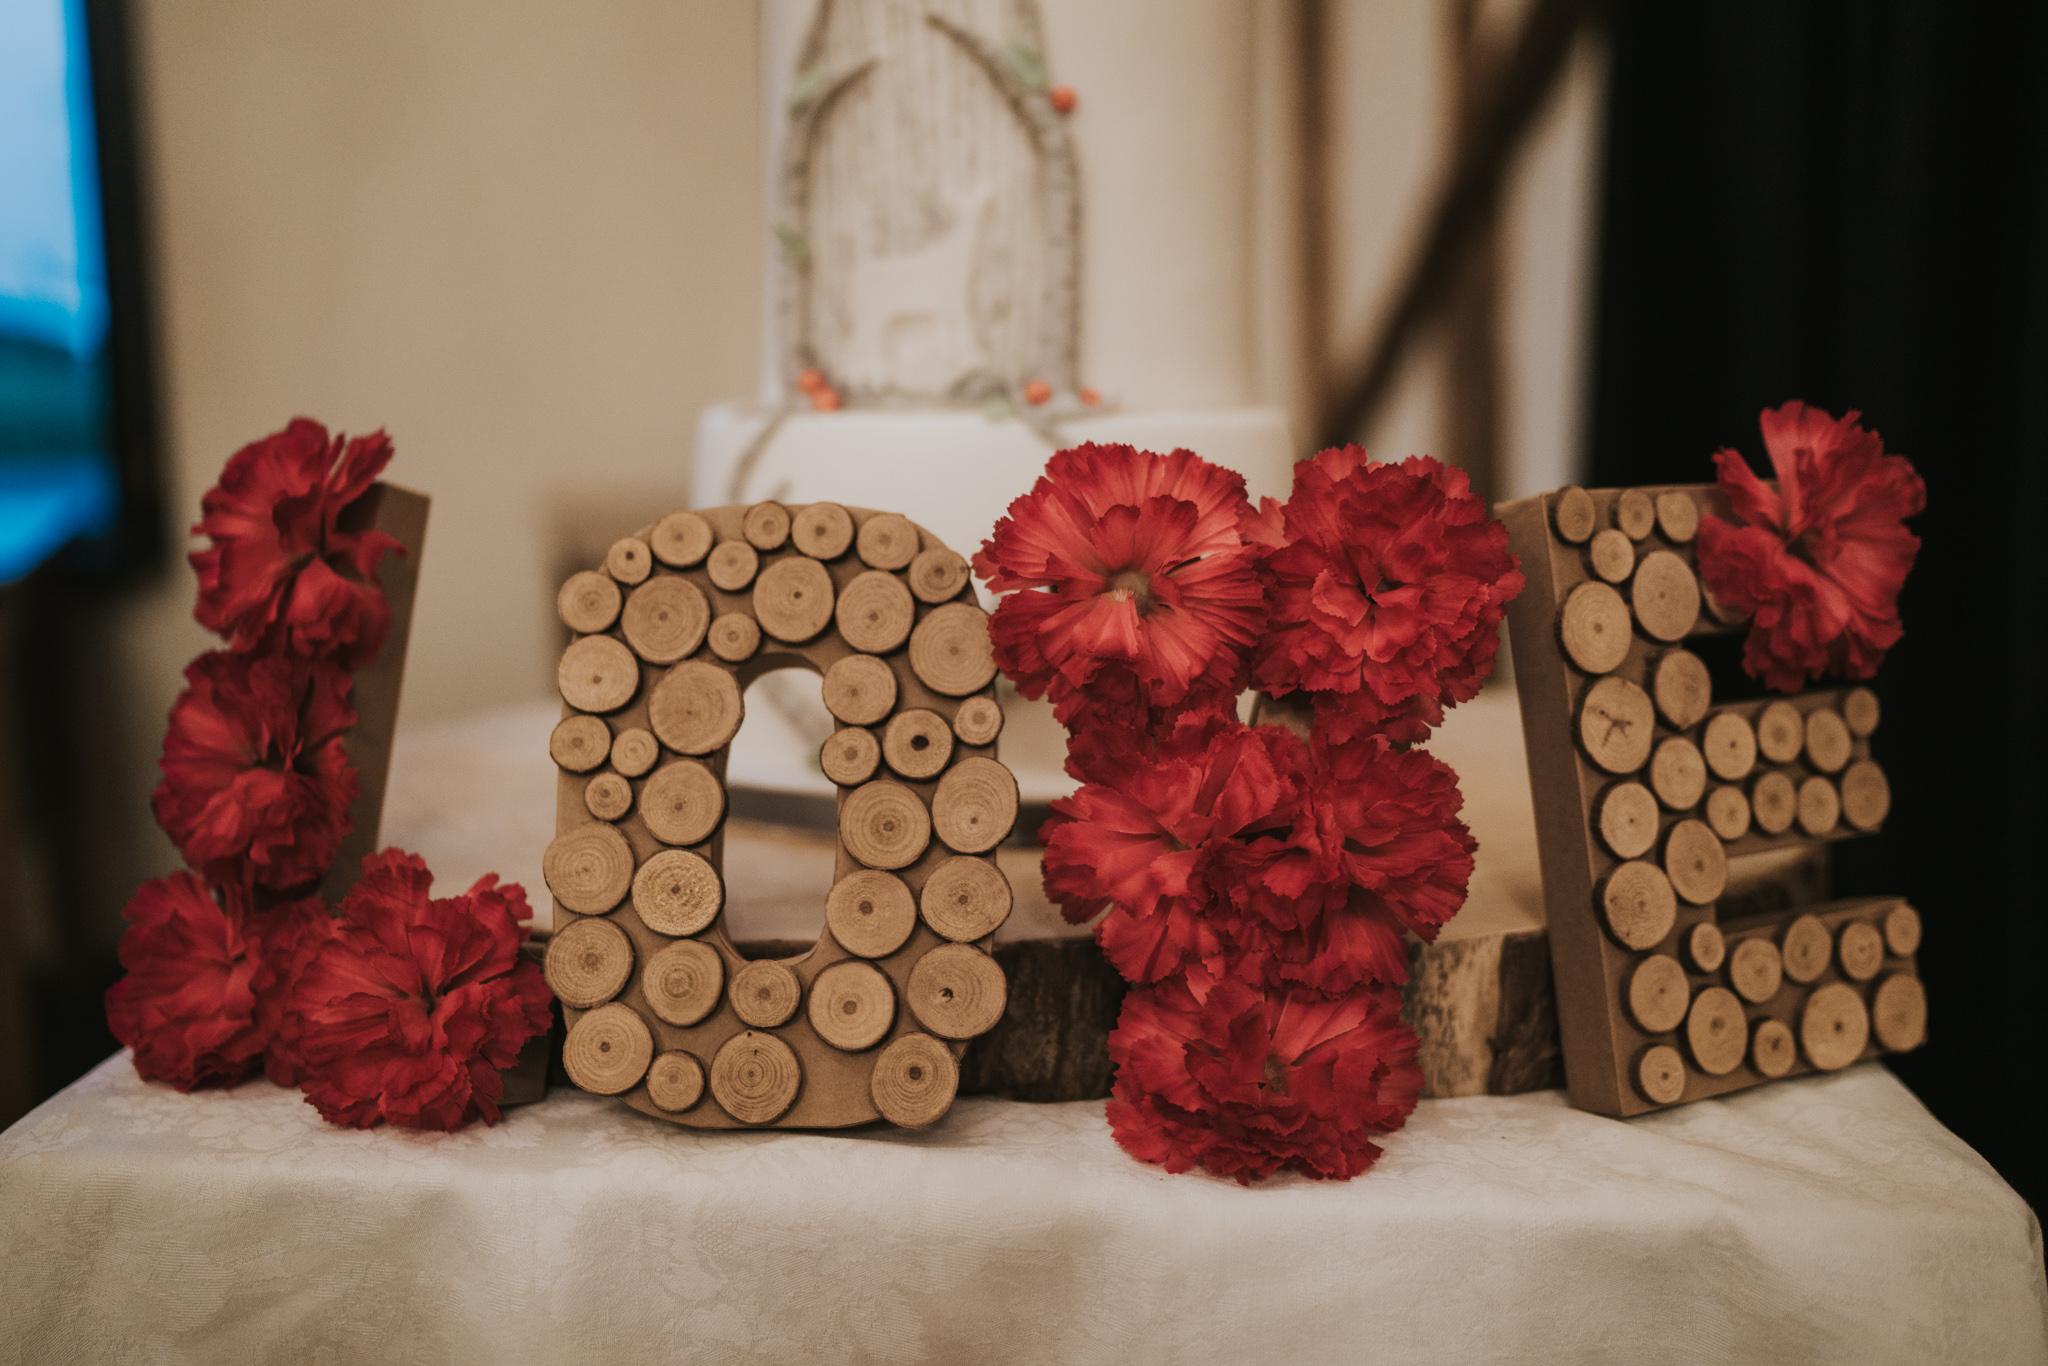 rhia-james-rustic-crabbs-barn-vintage-50s-retro-wedding-grace-elizabeth-colchester-essex-alternative-relaxed-wedding-family-photography-devon-suffolk-norfolk-essex (108 of 138).jpg